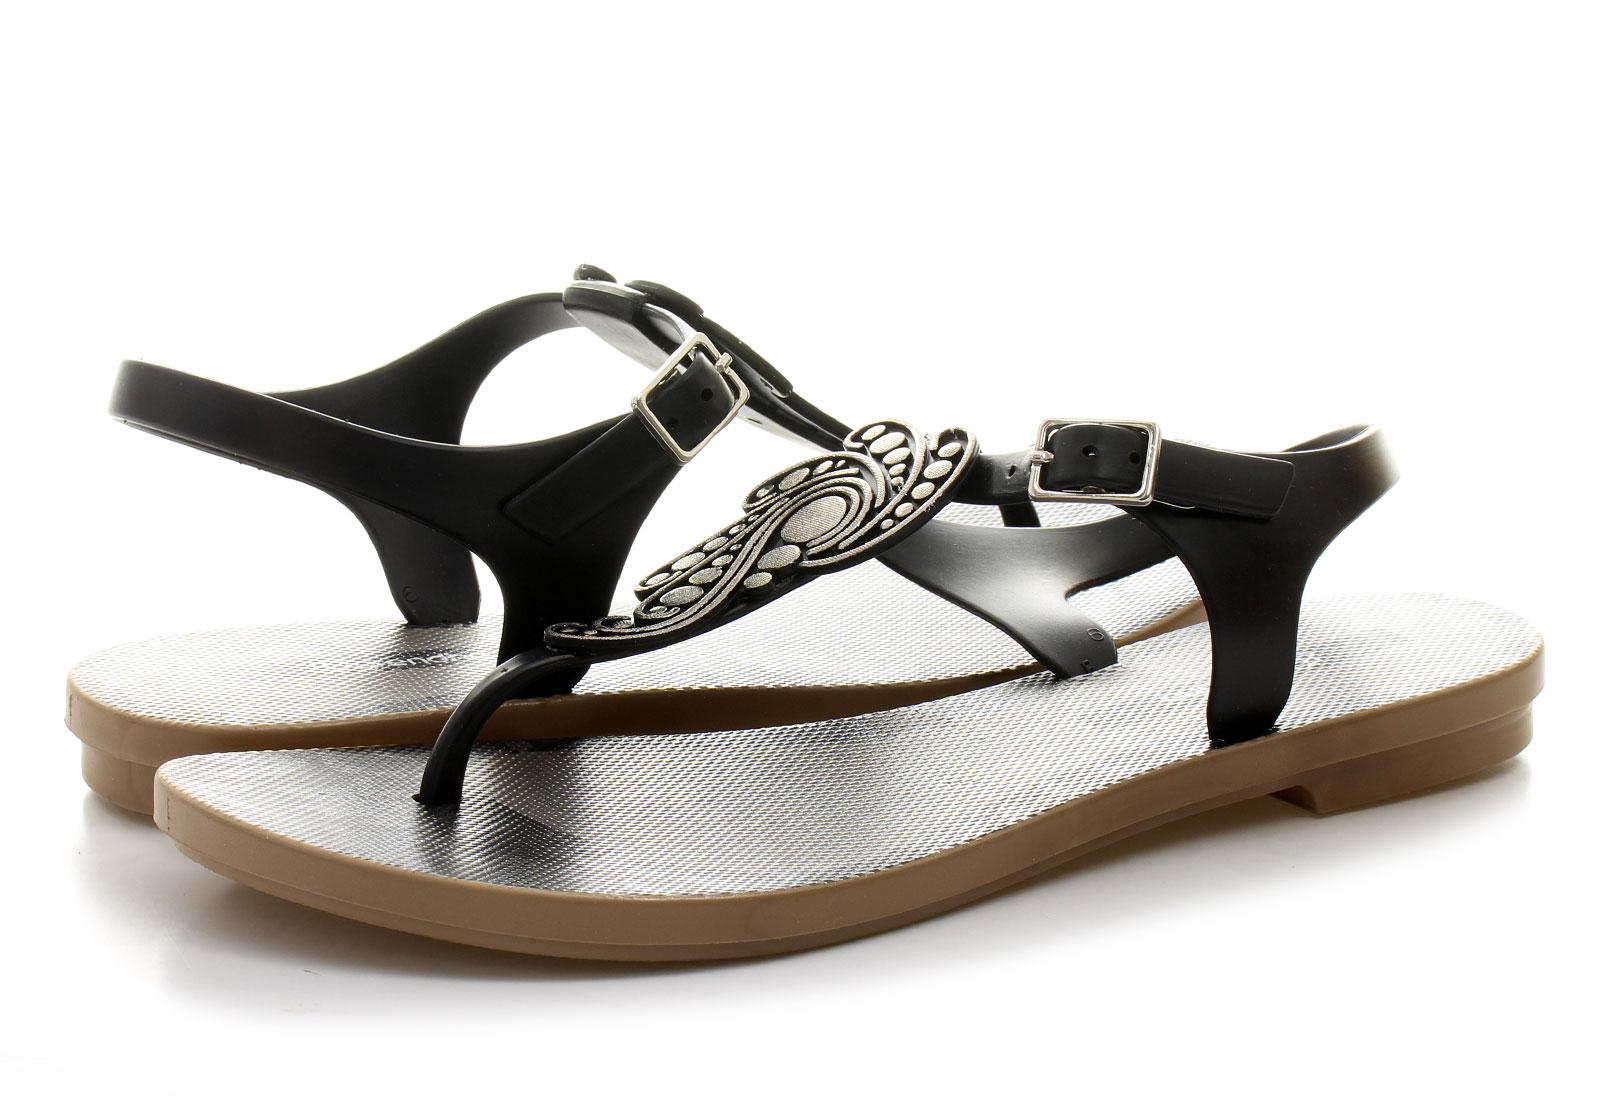 Grendha Shoe Brand